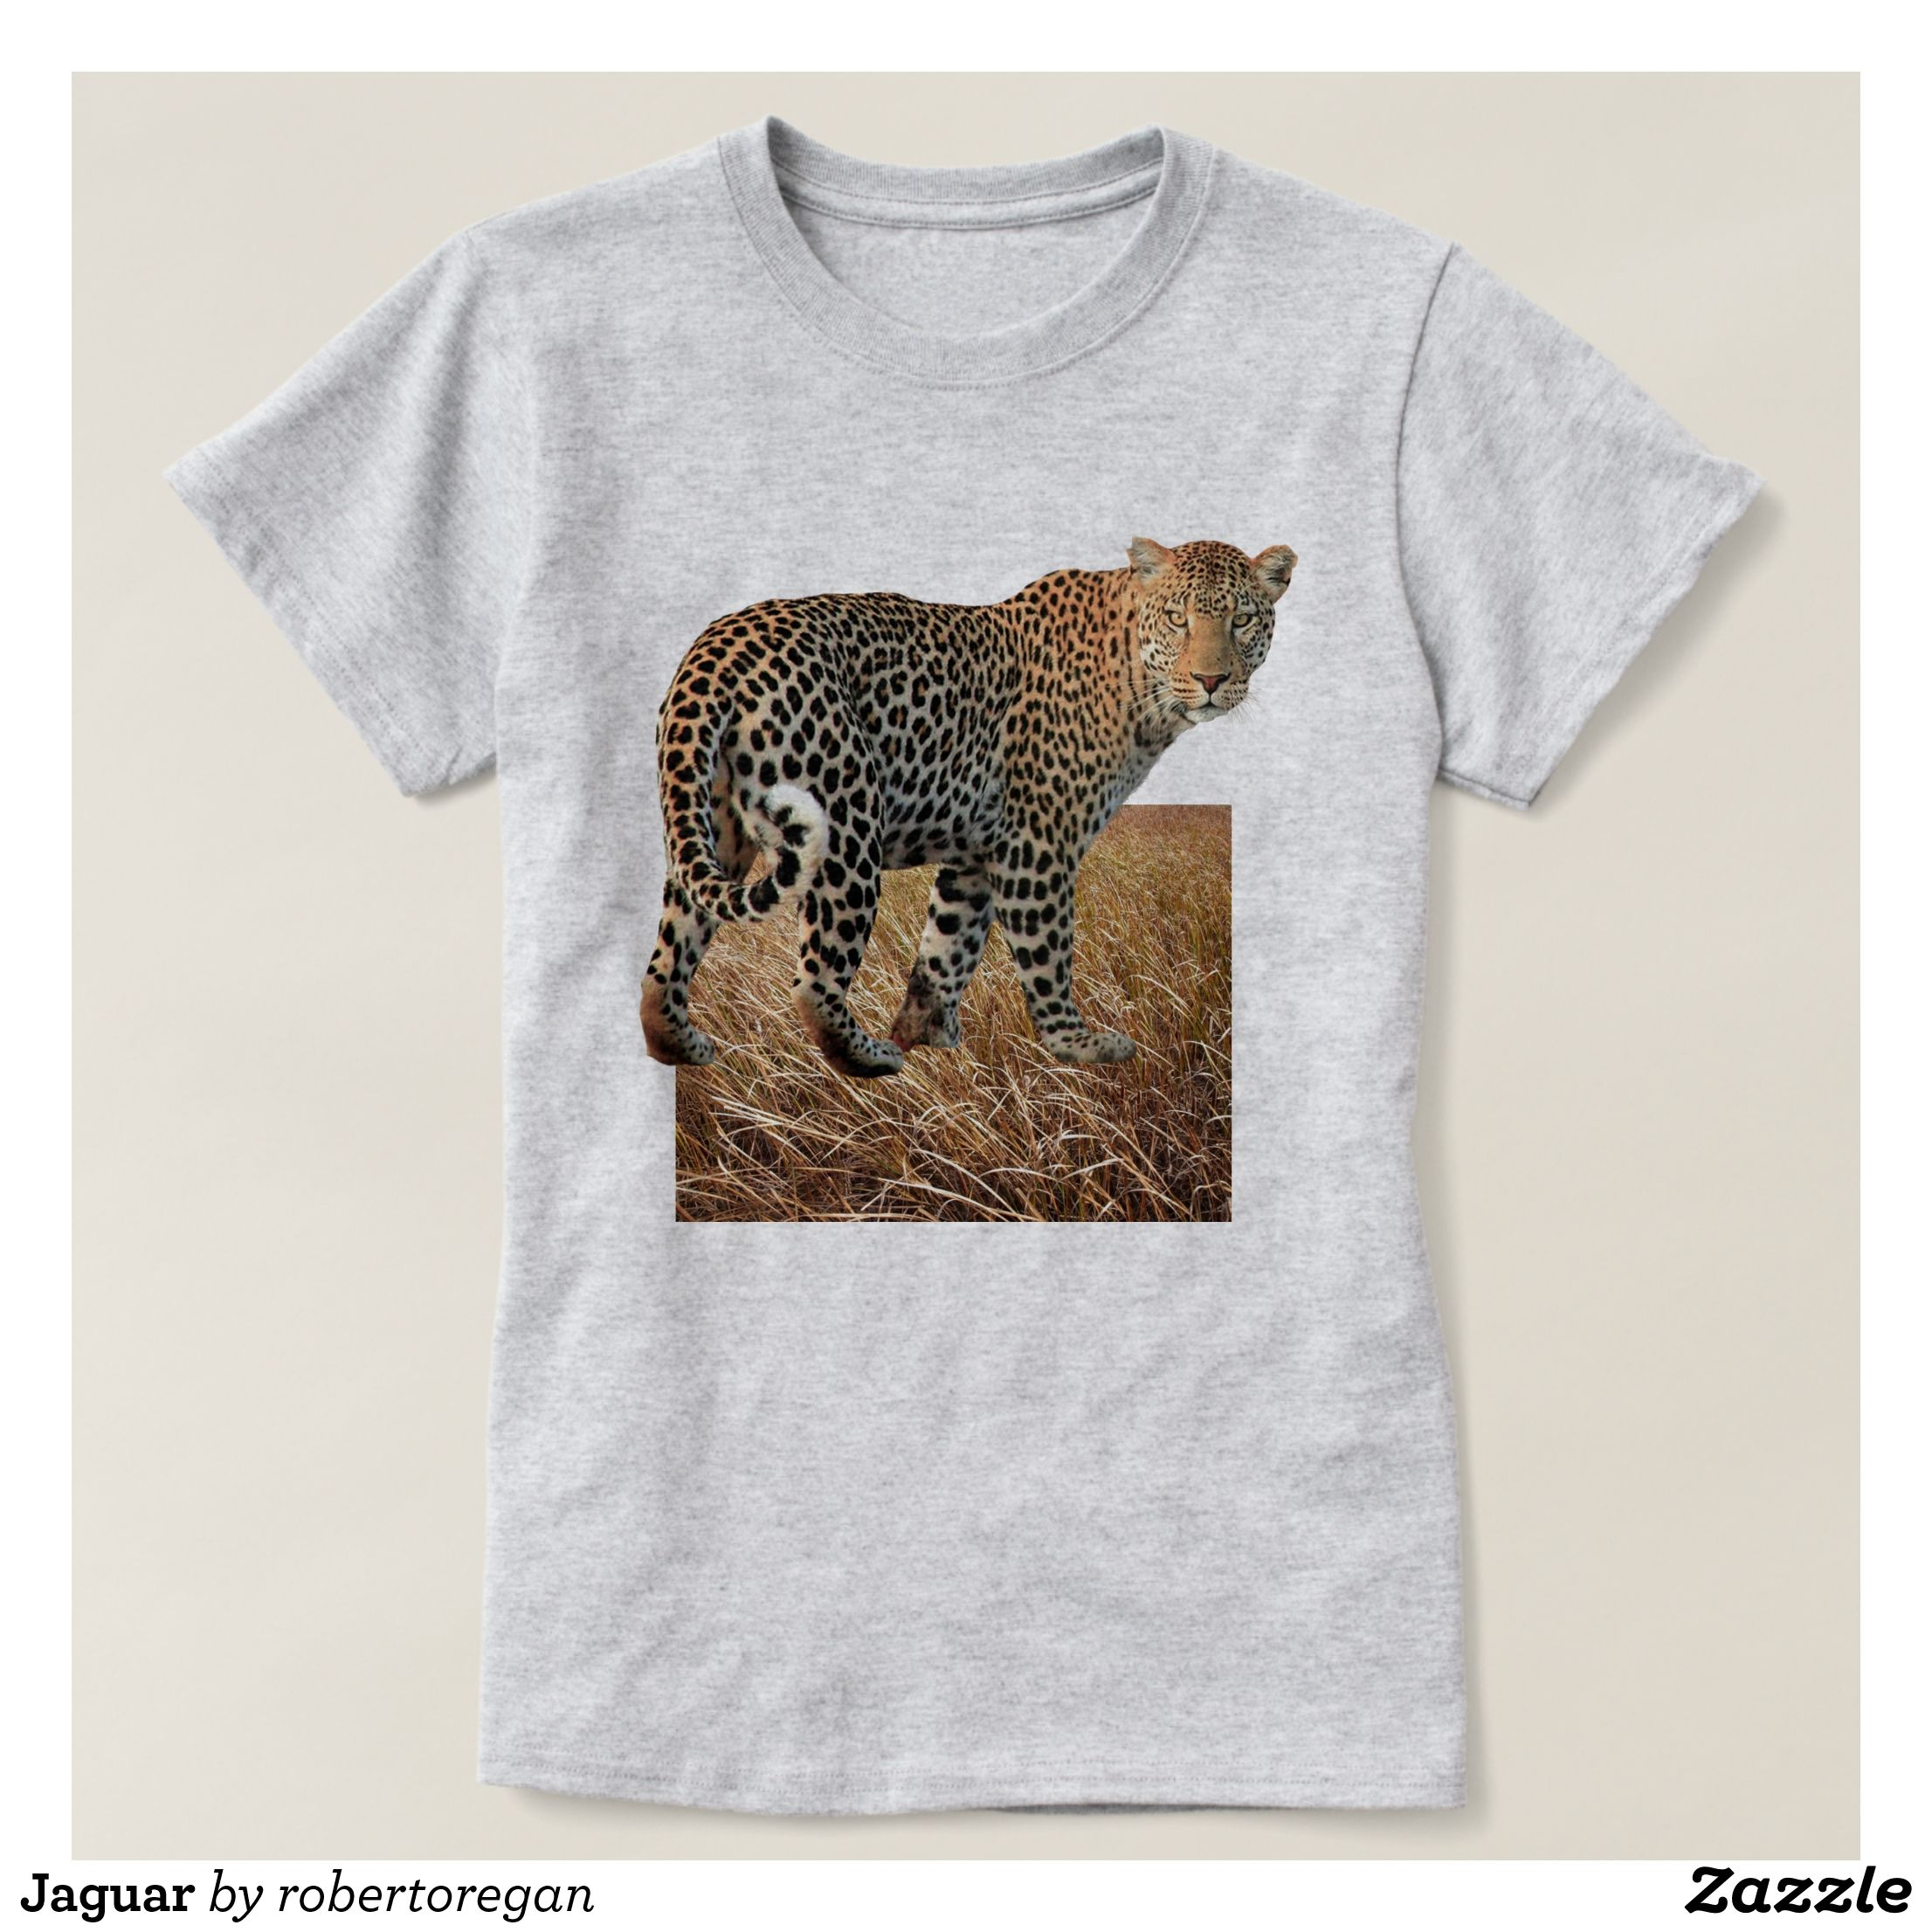 shirts mascot sm university huge new jaguar t su southern jaguars tshirt nwt p s ladies logo shirt